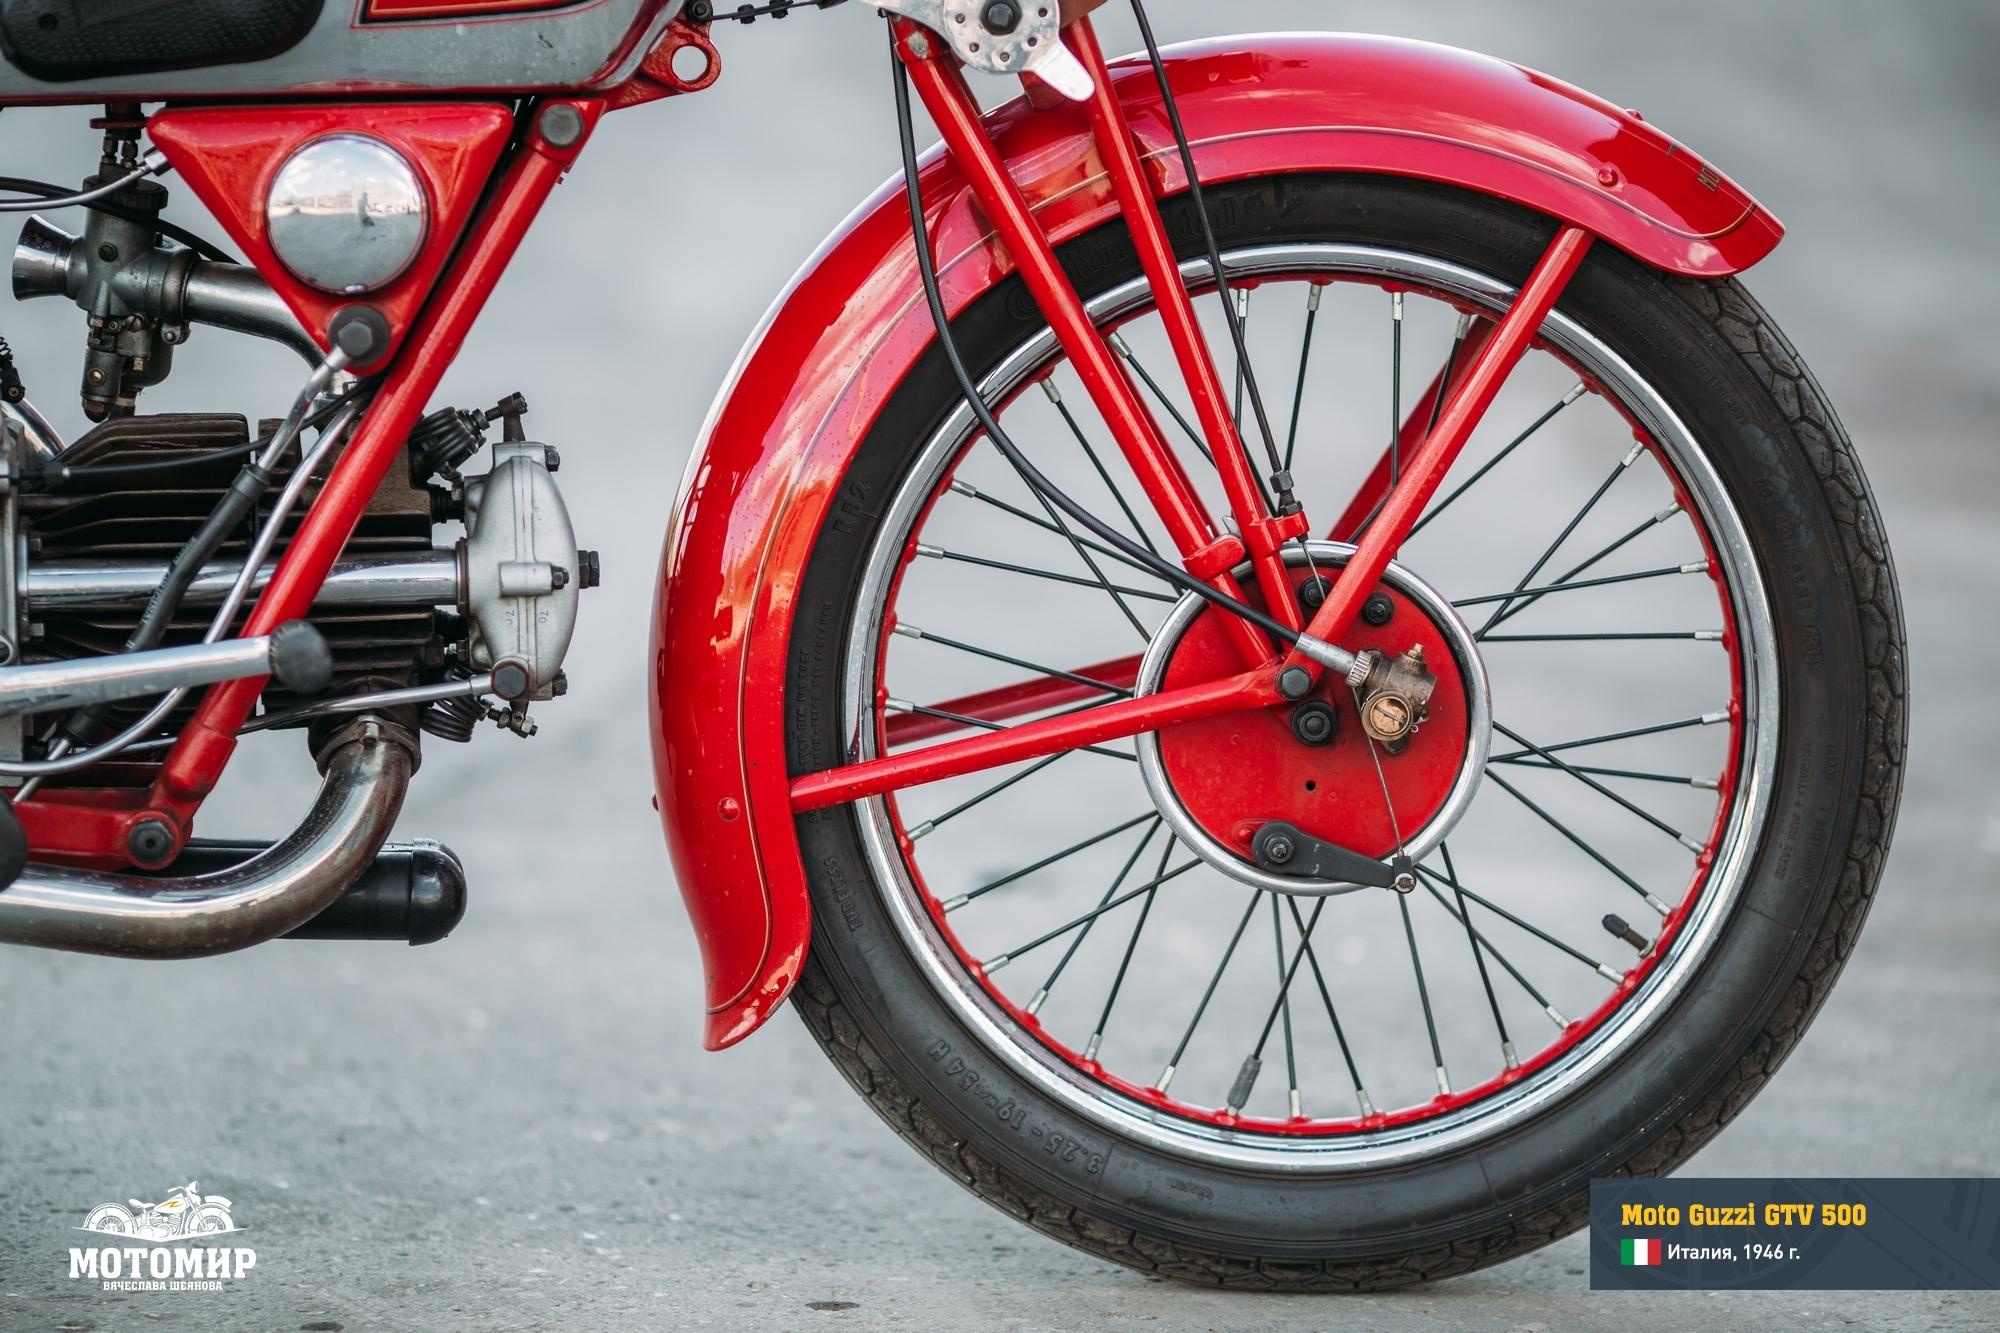 moto-guzzi-gtv-500-201509-web-22